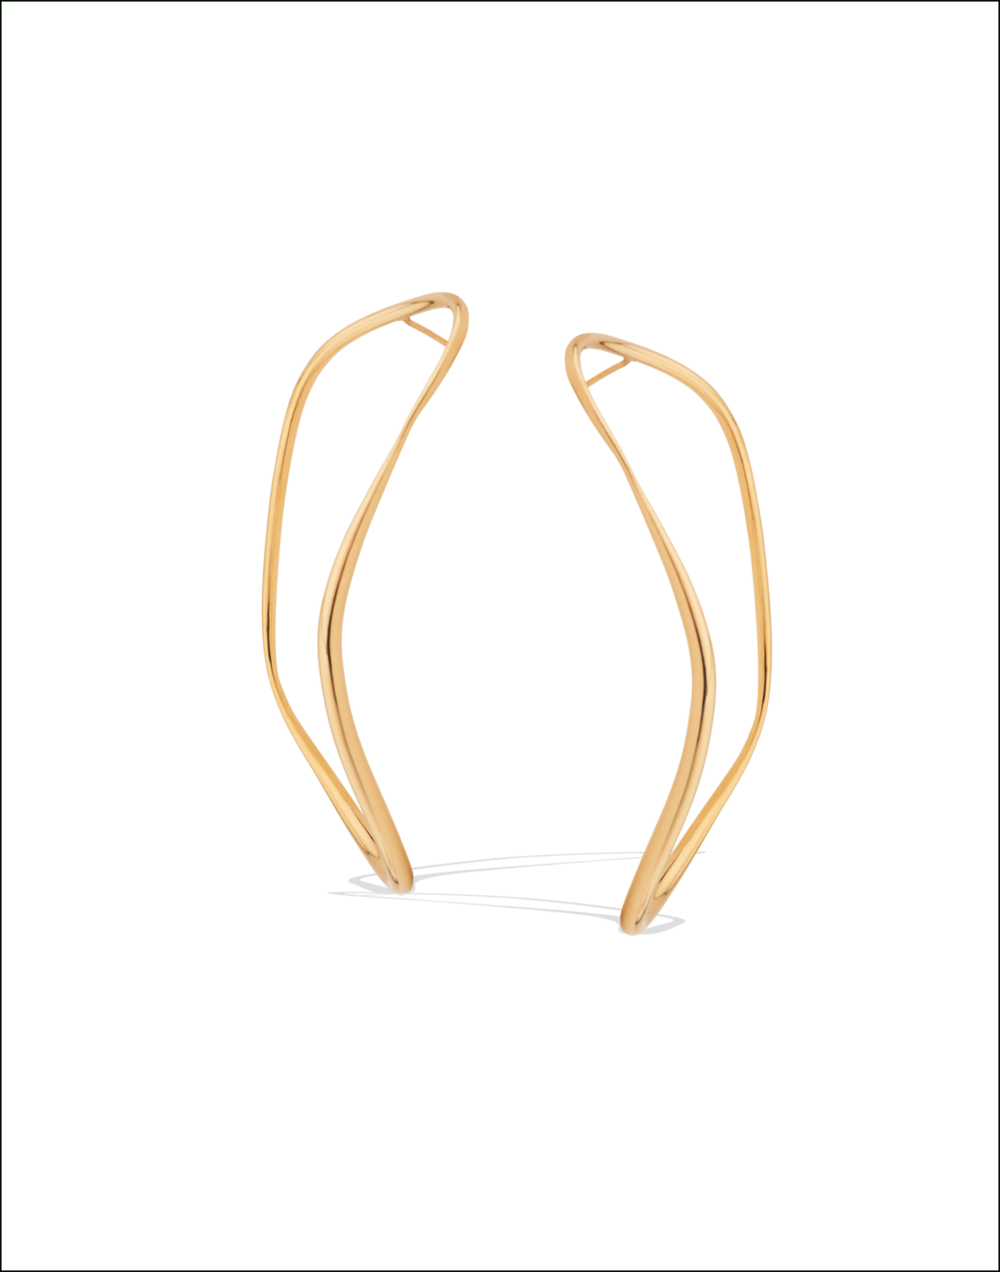 Completedworks-Earrings-Gold-Vermeil-Subcommittees-2-1.png